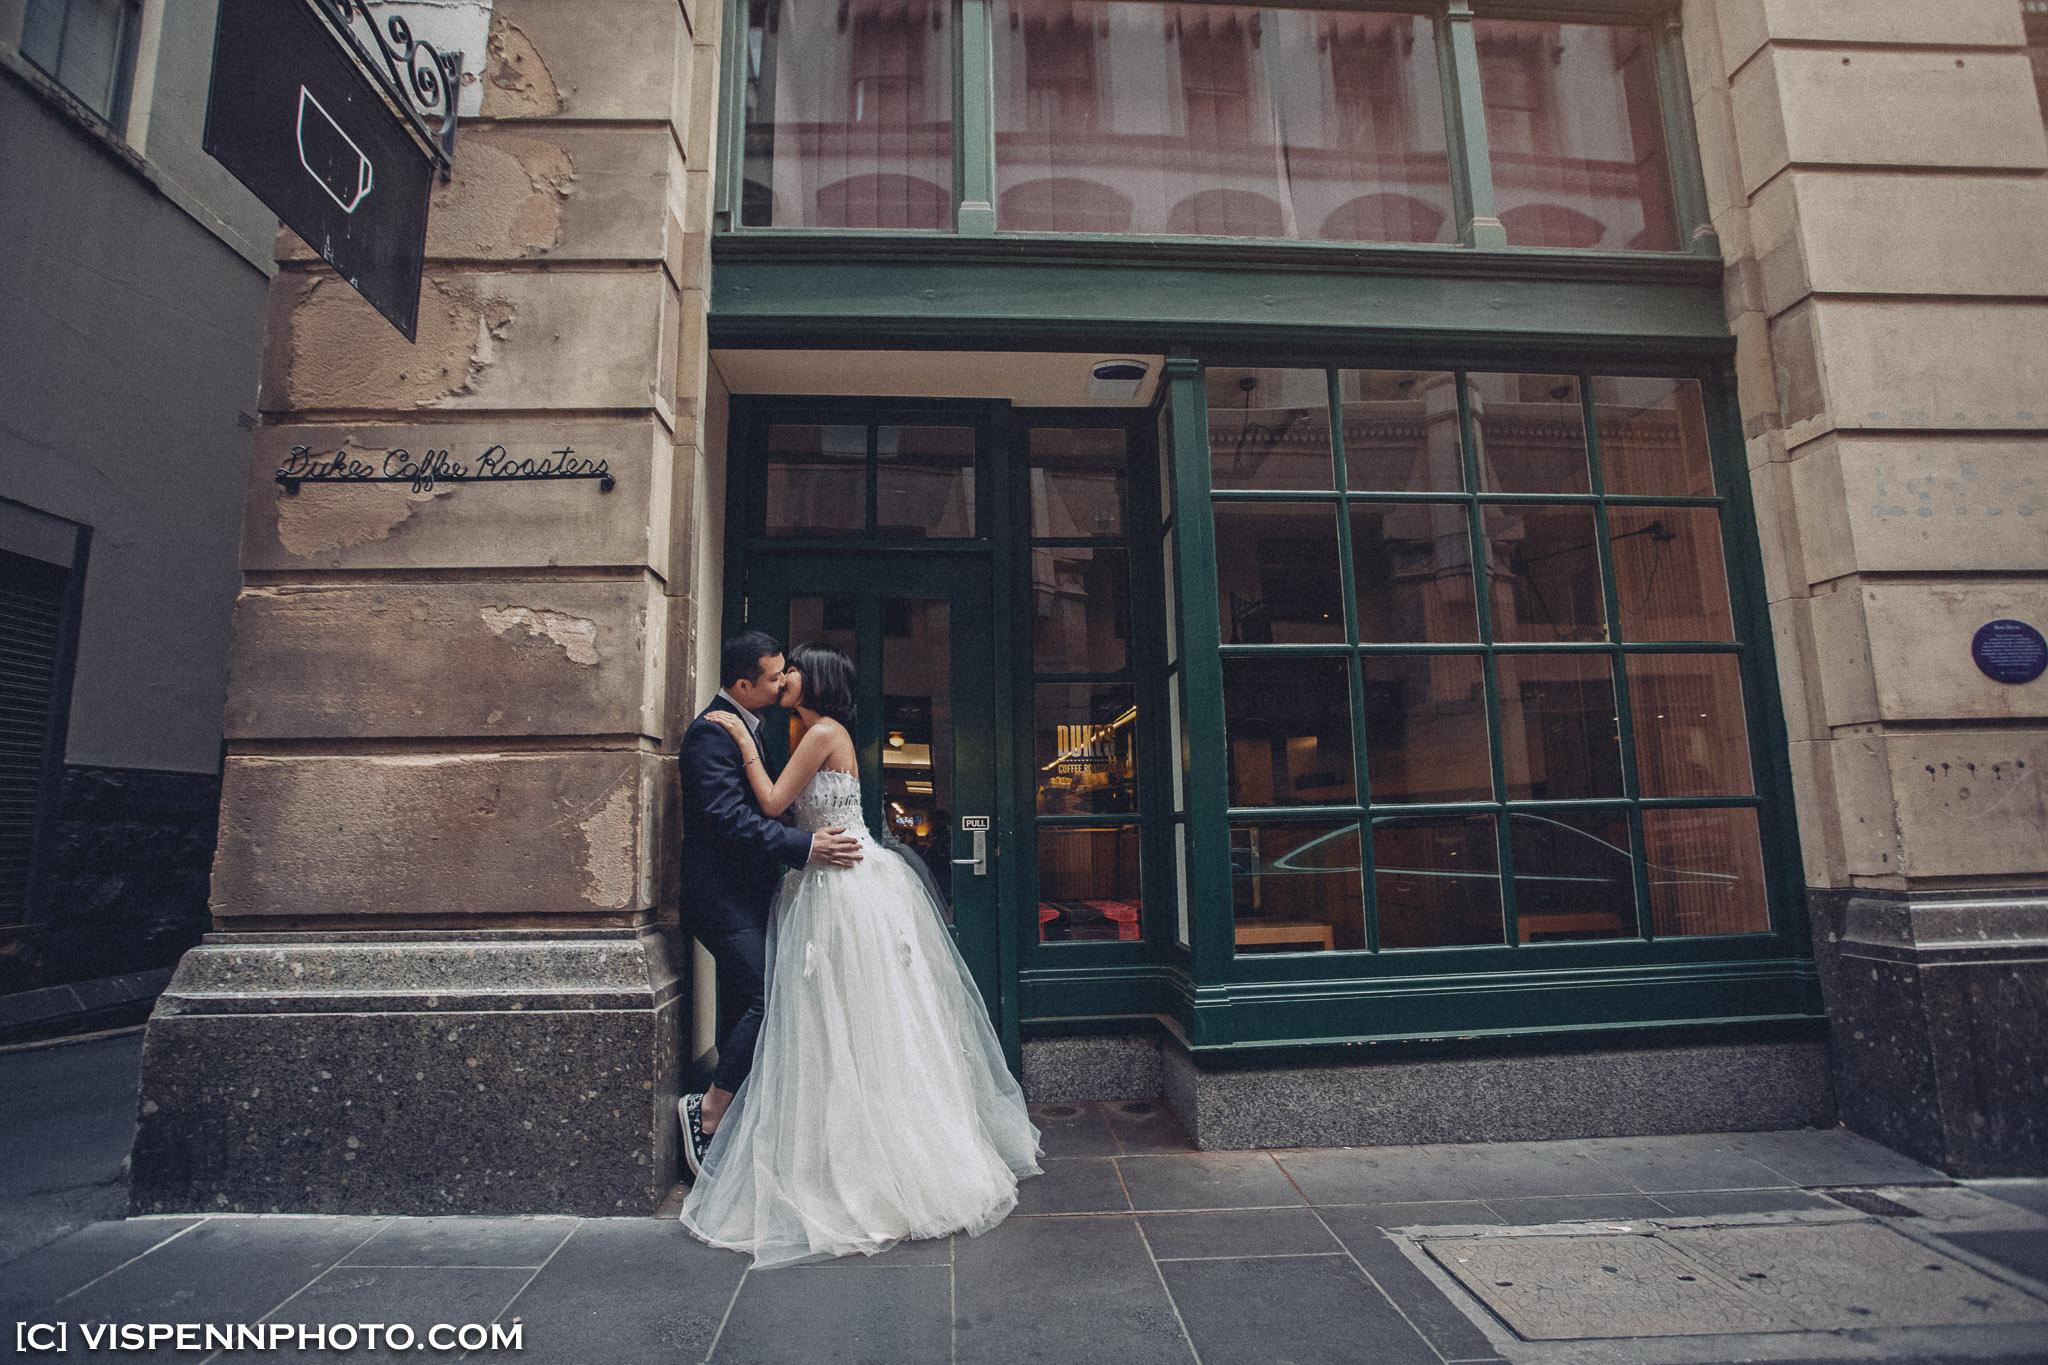 PRE WEDDING Photography Melbourne 5D3 7054